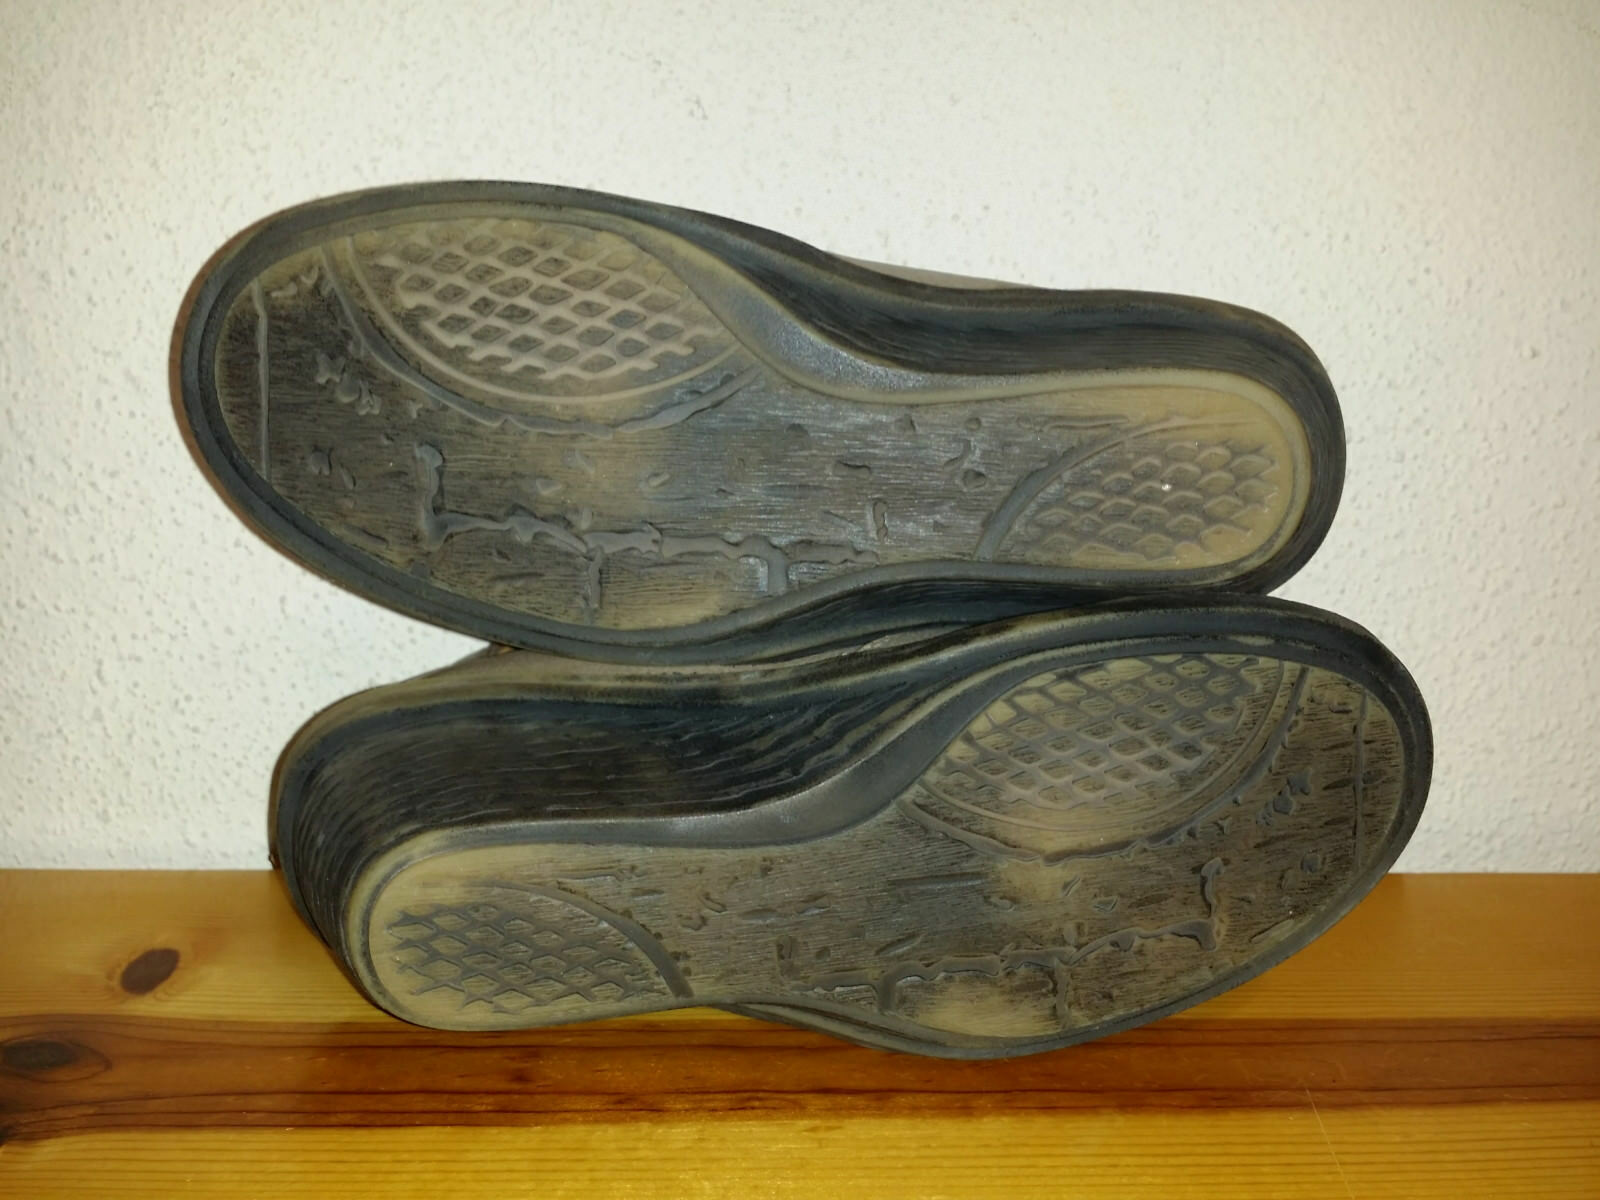 140 NEW Womens Womens Womens 6.5M EUR 37 OTBT Mary Jane Biker Wedge Sandals Pecan cd1edb